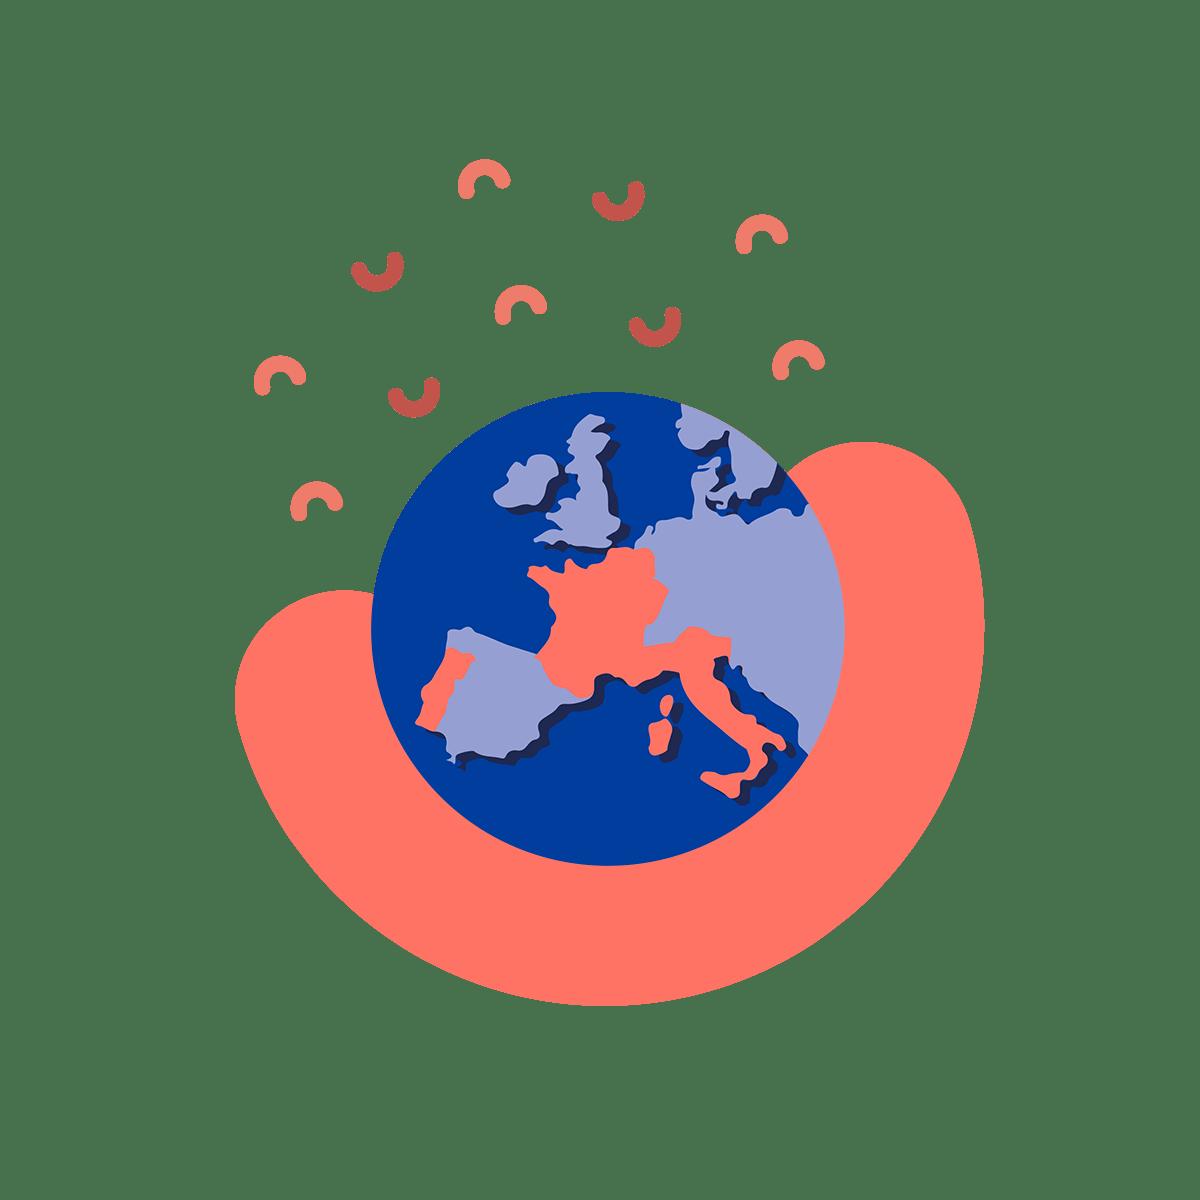 Shopopop con mappa d'Europa